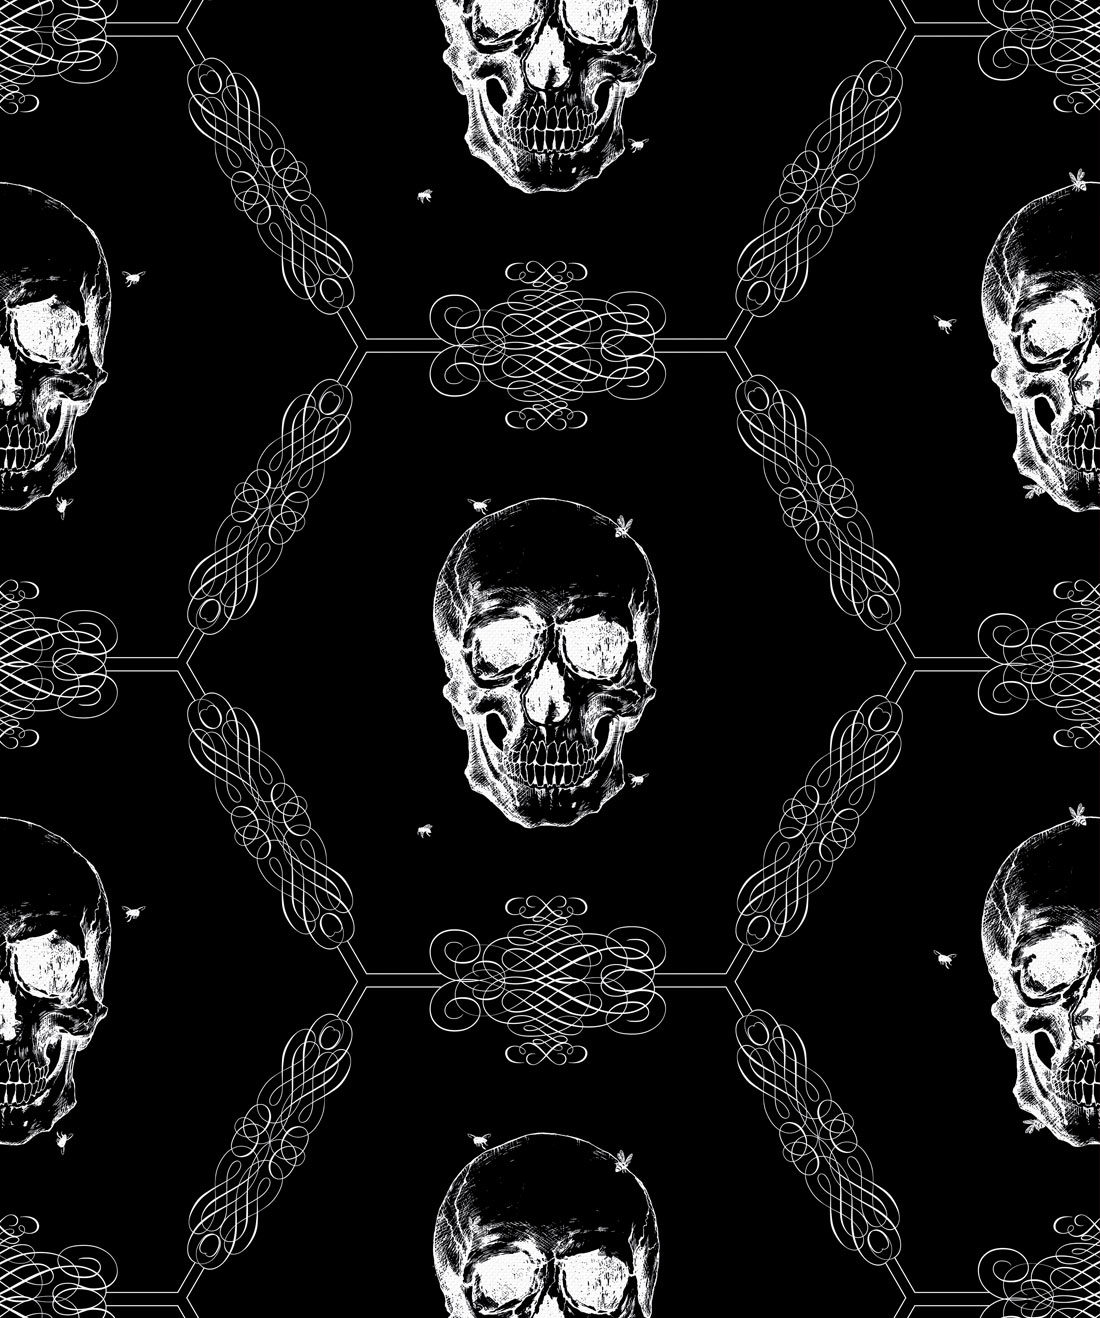 Skull Bee Gothic Wallpaper Kingdom Home Milton King Aus